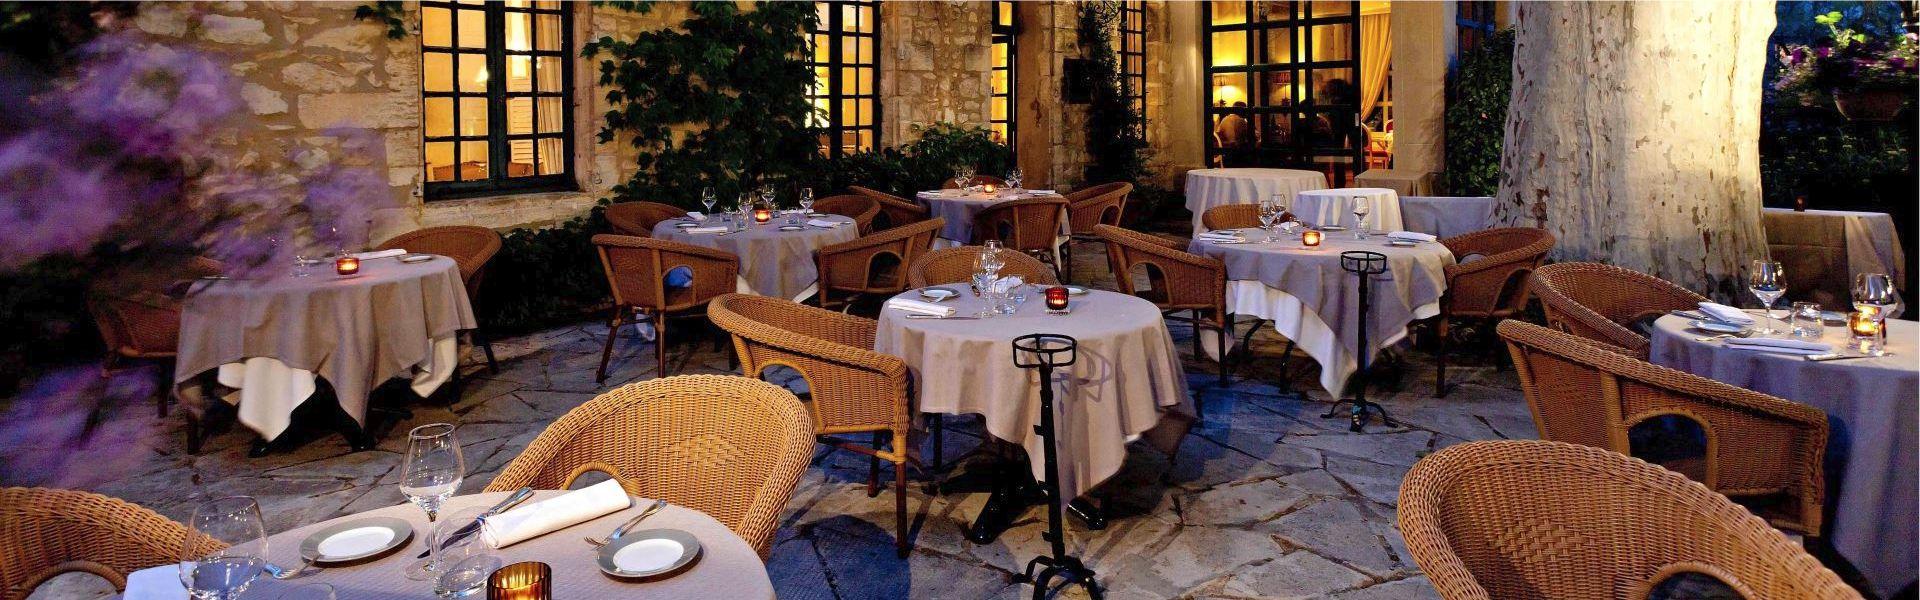 Terrasse du Najeti restaurant le Mûrier de Villeneuve-lez-Avignon.